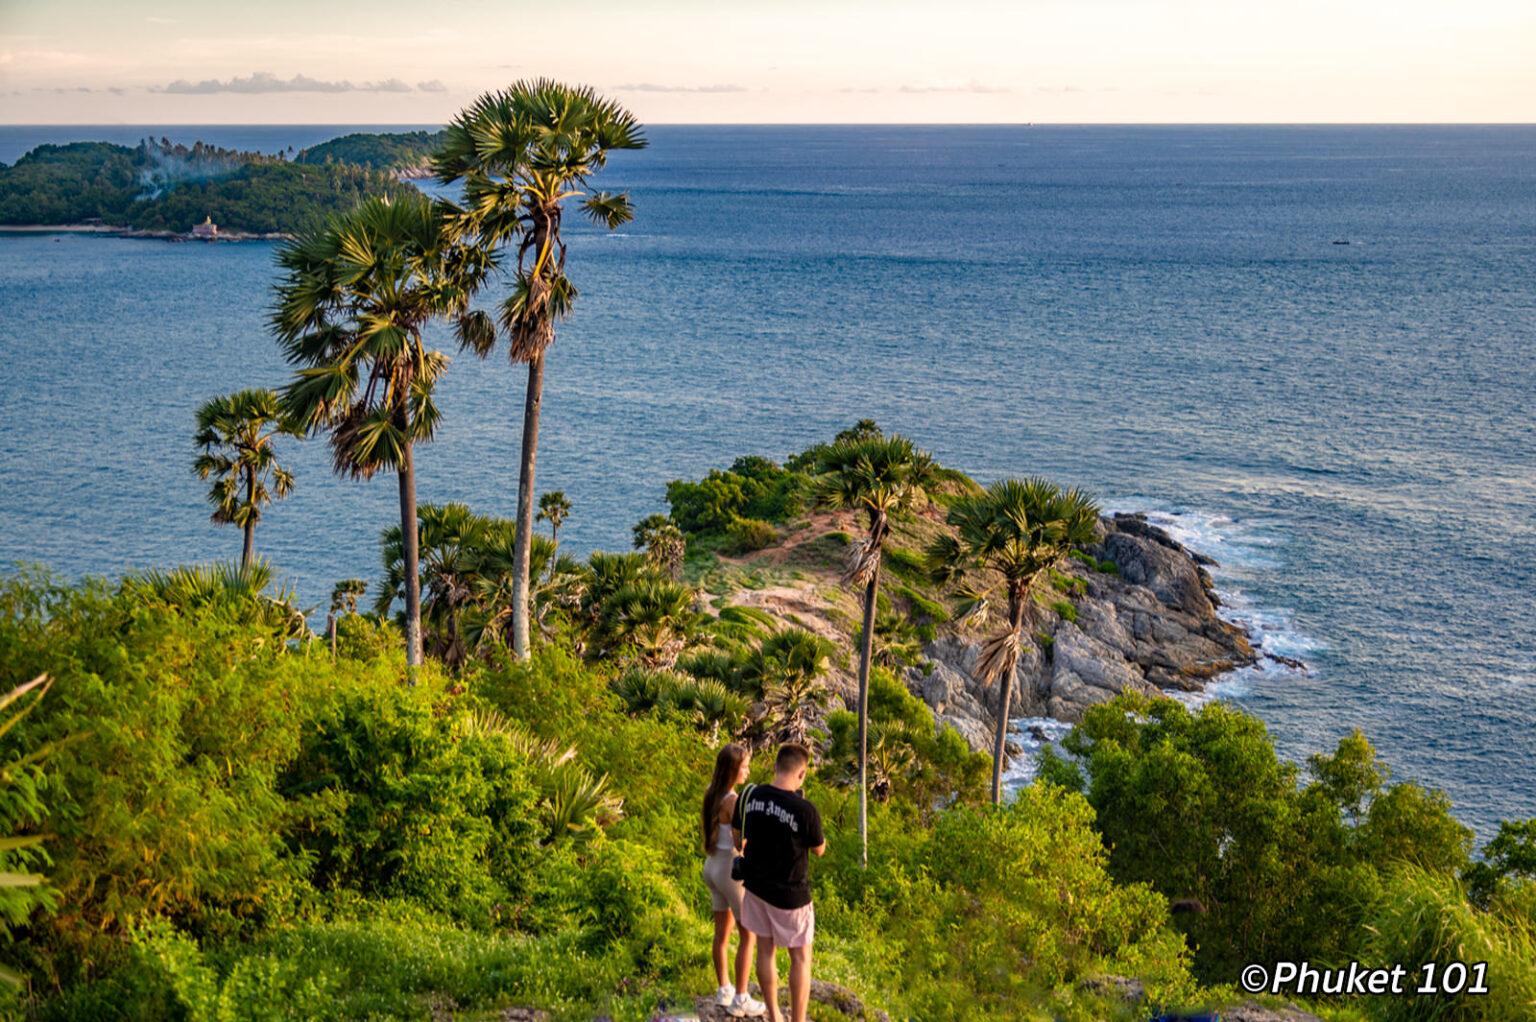 Promthep Cape in the south of Phuket